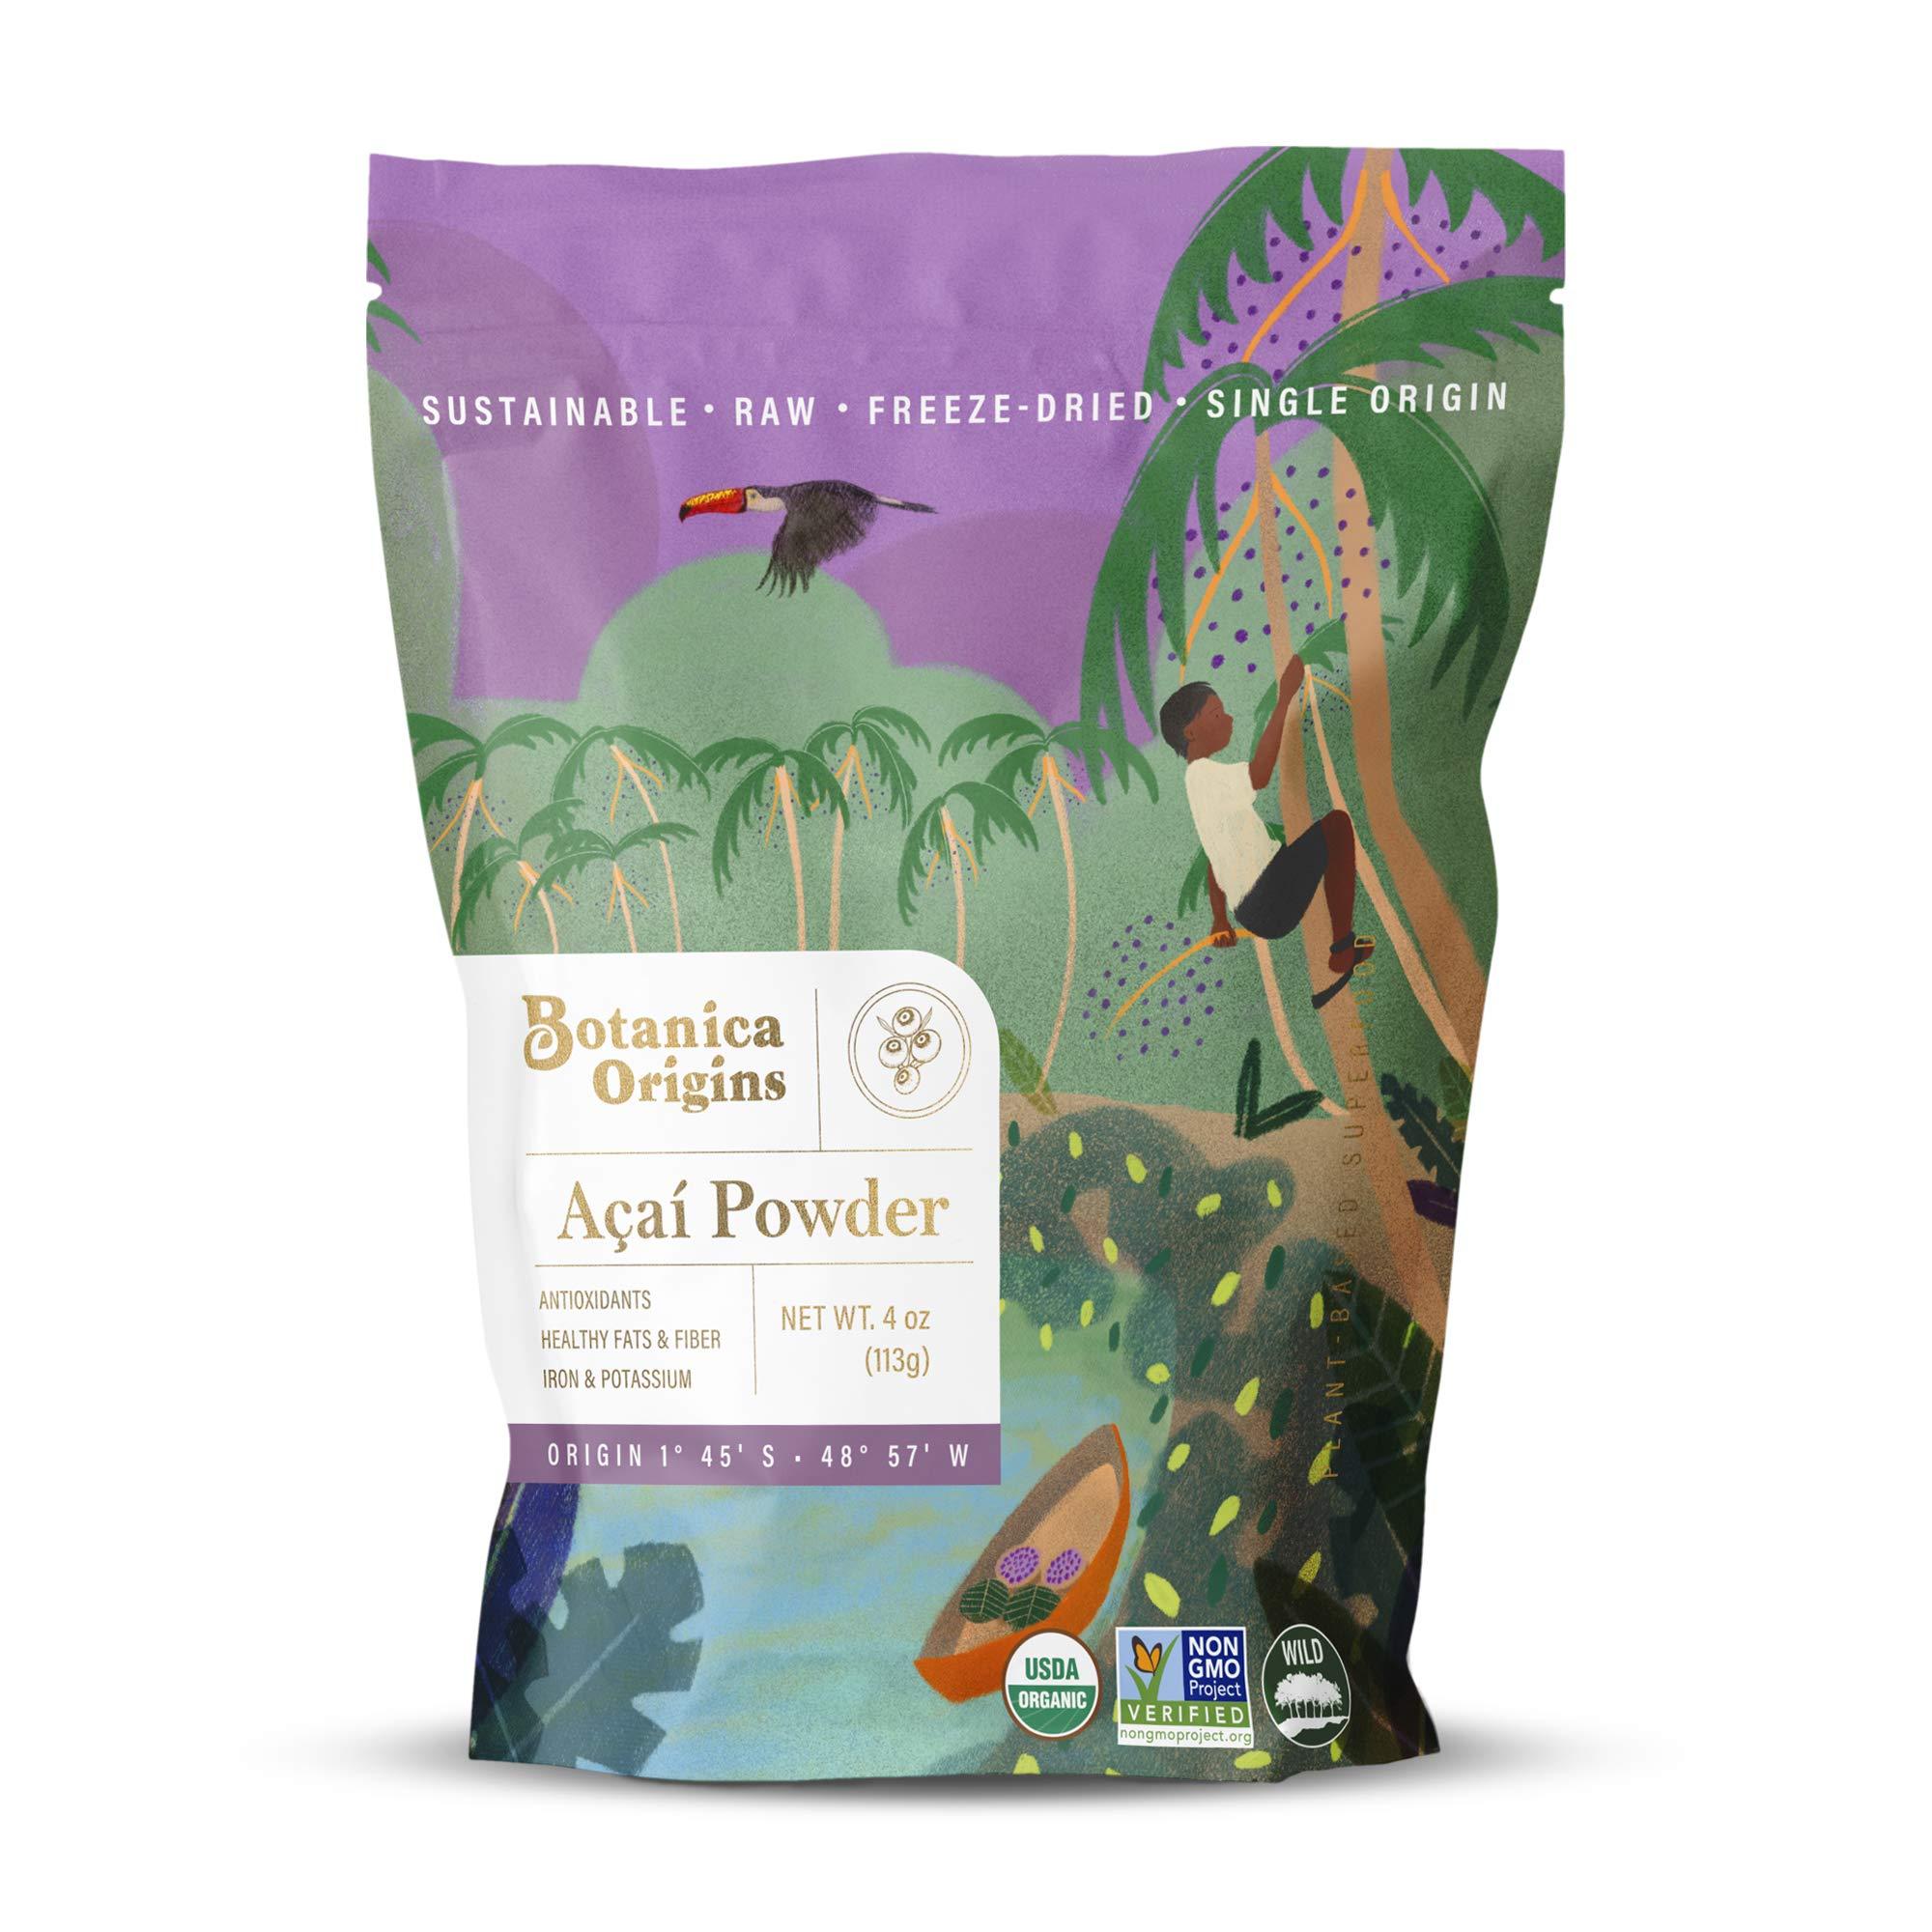 Botanica Origins Premium Wild & Organic Acai Powder, 4 oz | Raw | Freeze-Dried | Non-GMO | Wild Harvest | Vegan, Keto and Paleo Friendly